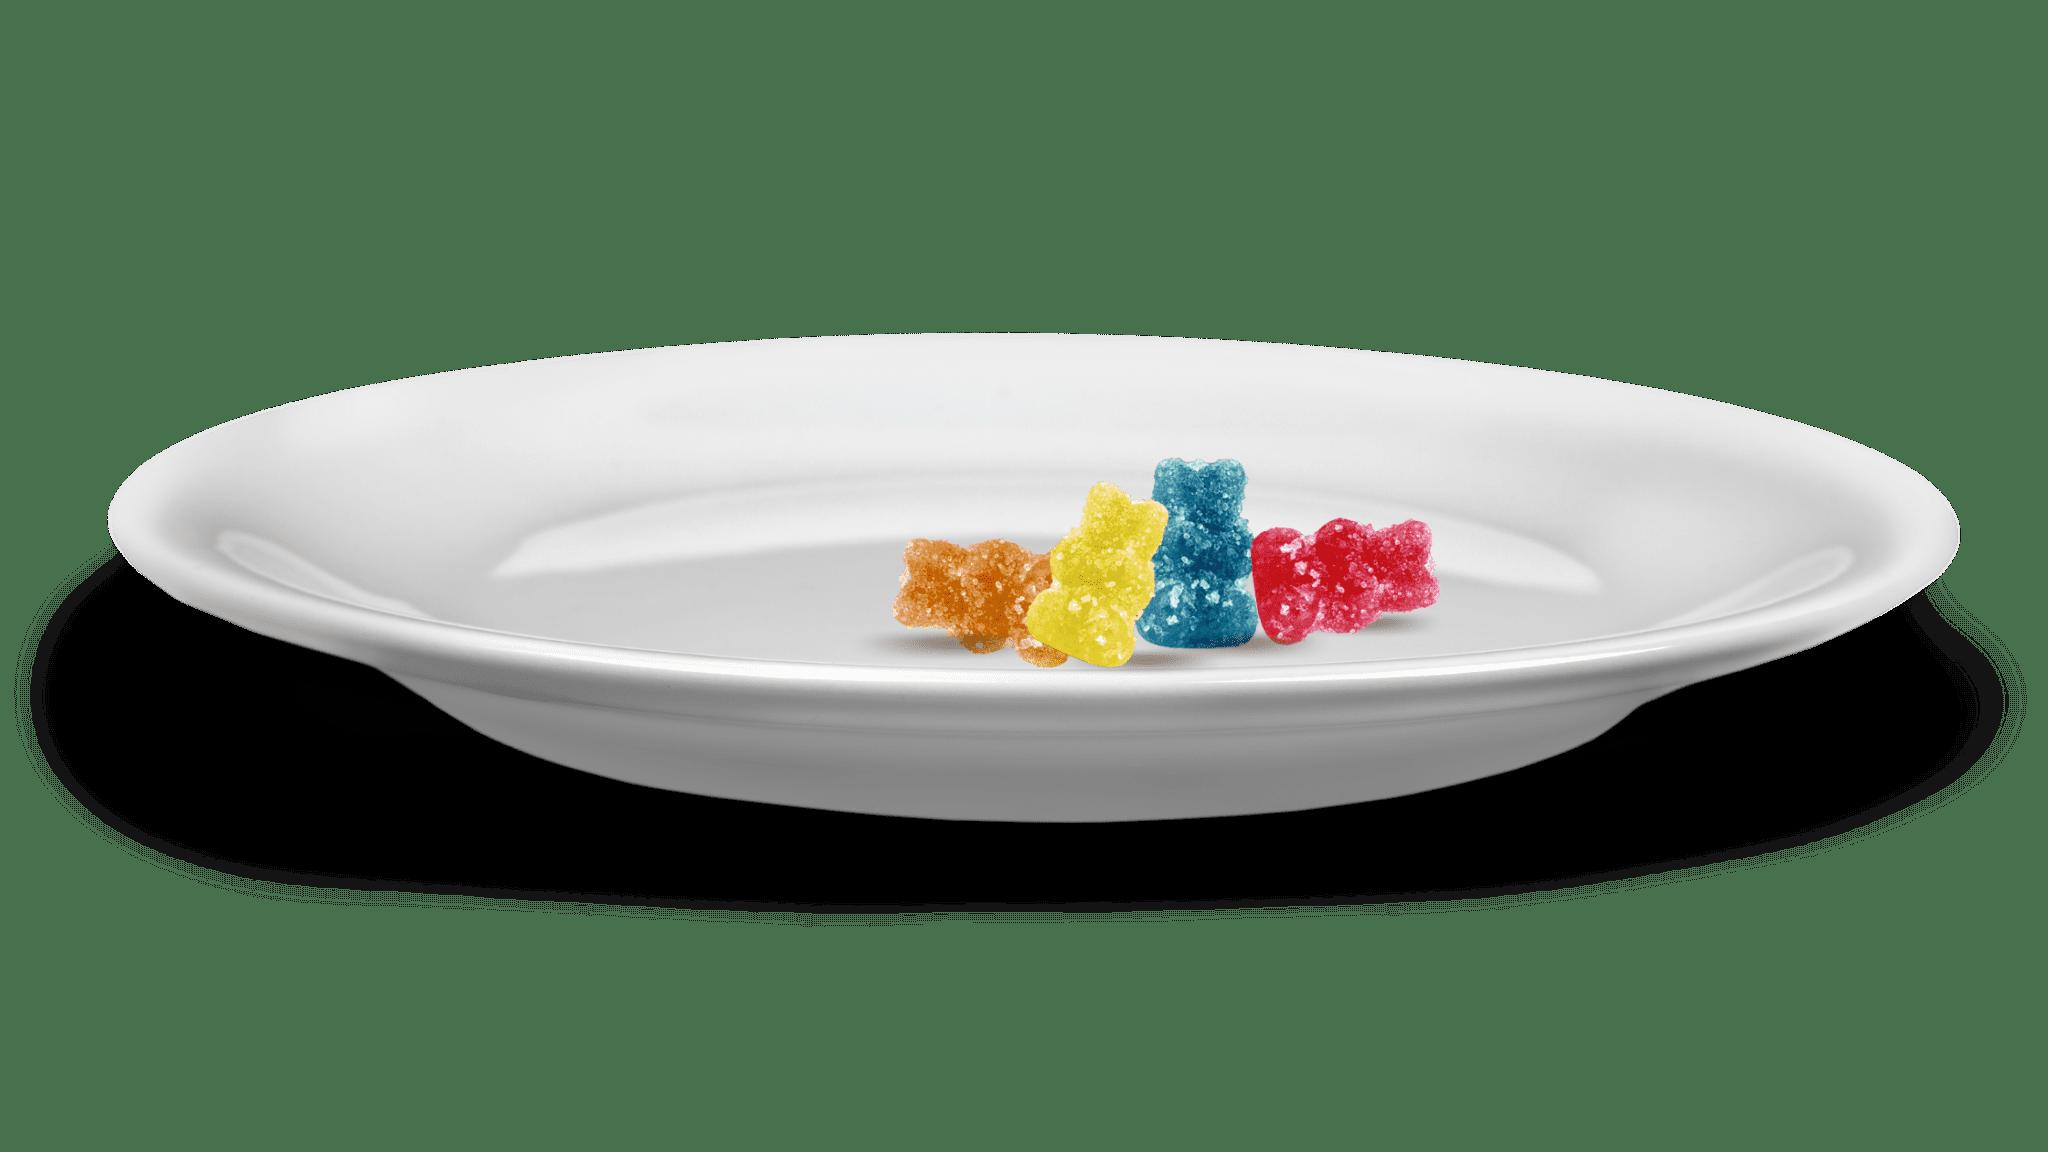 gummy-bears-on-plate